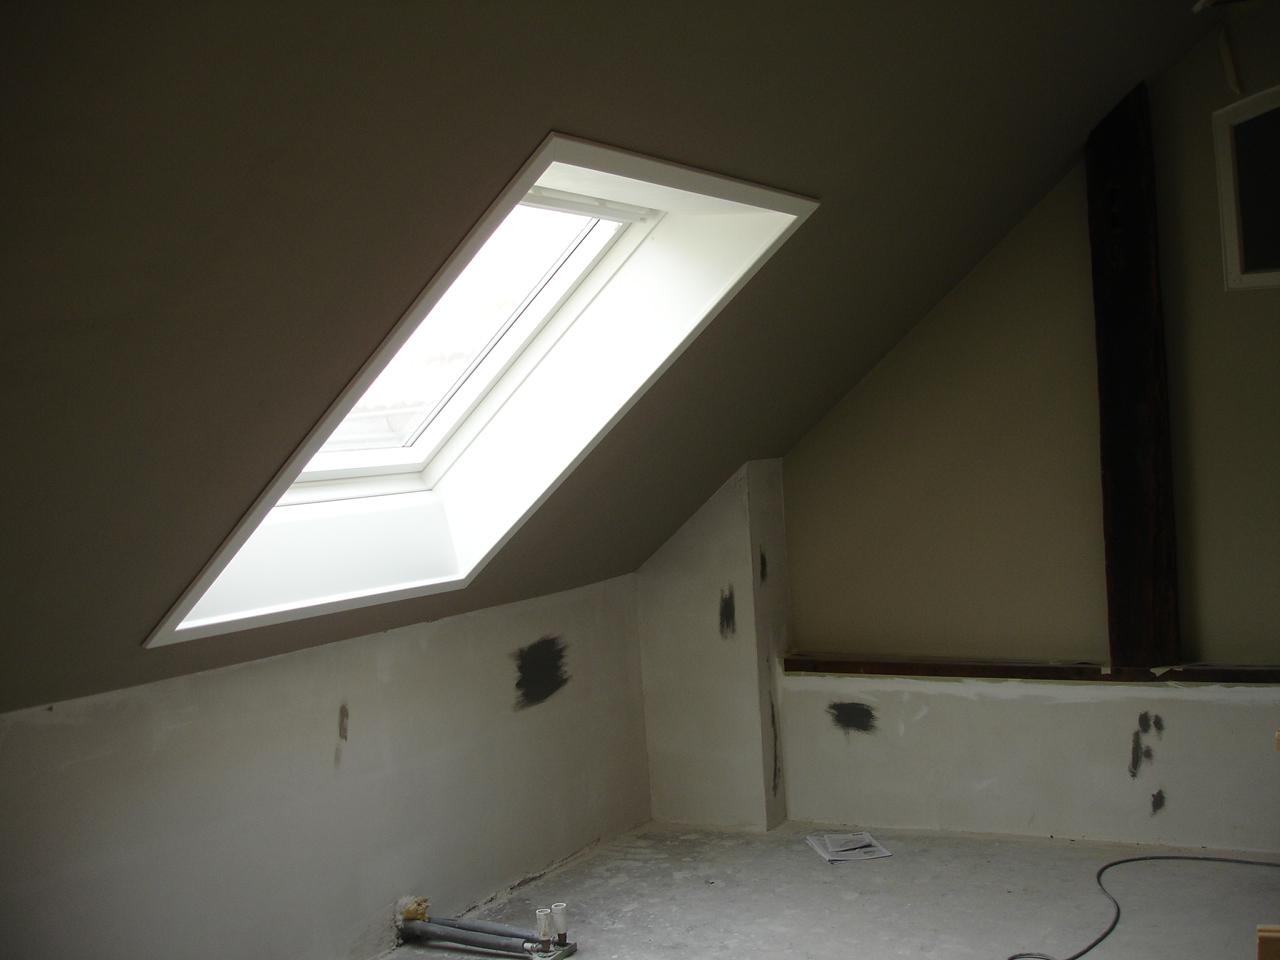 dachfenster innenfutter rigips ideen fur was wohndesign. Black Bedroom Furniture Sets. Home Design Ideas